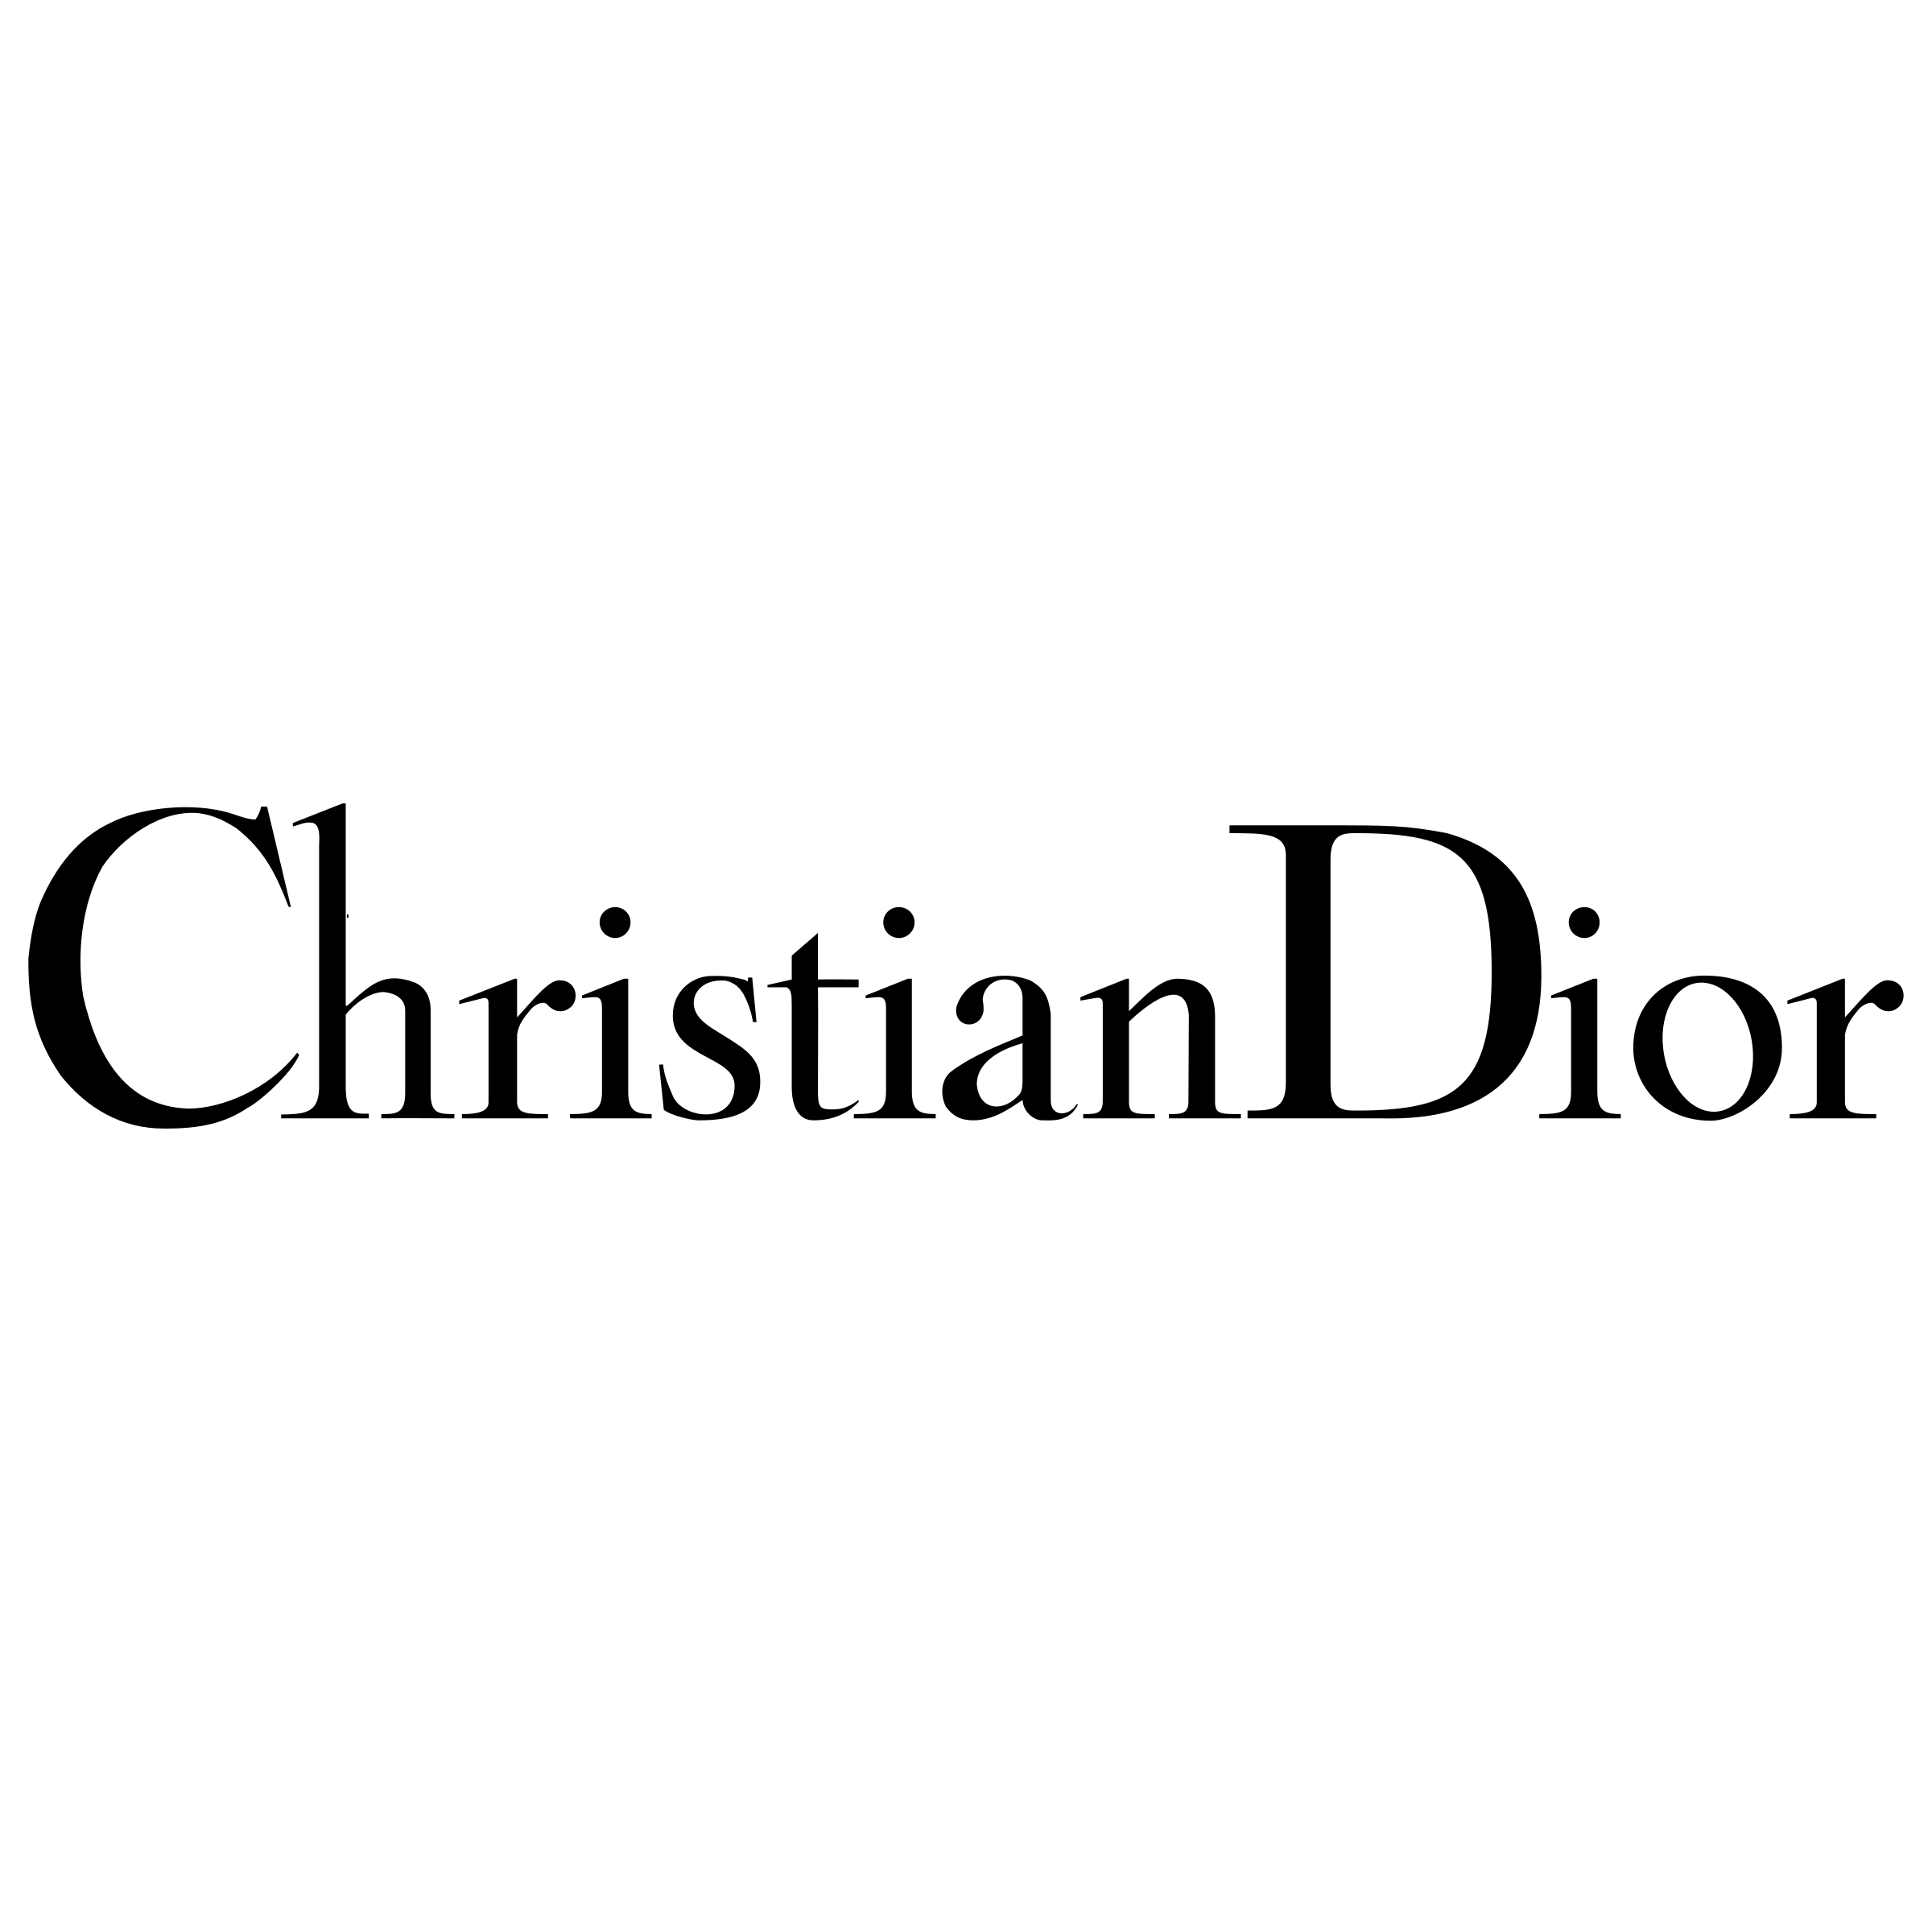 christian-dior-logo-png-transparent.png